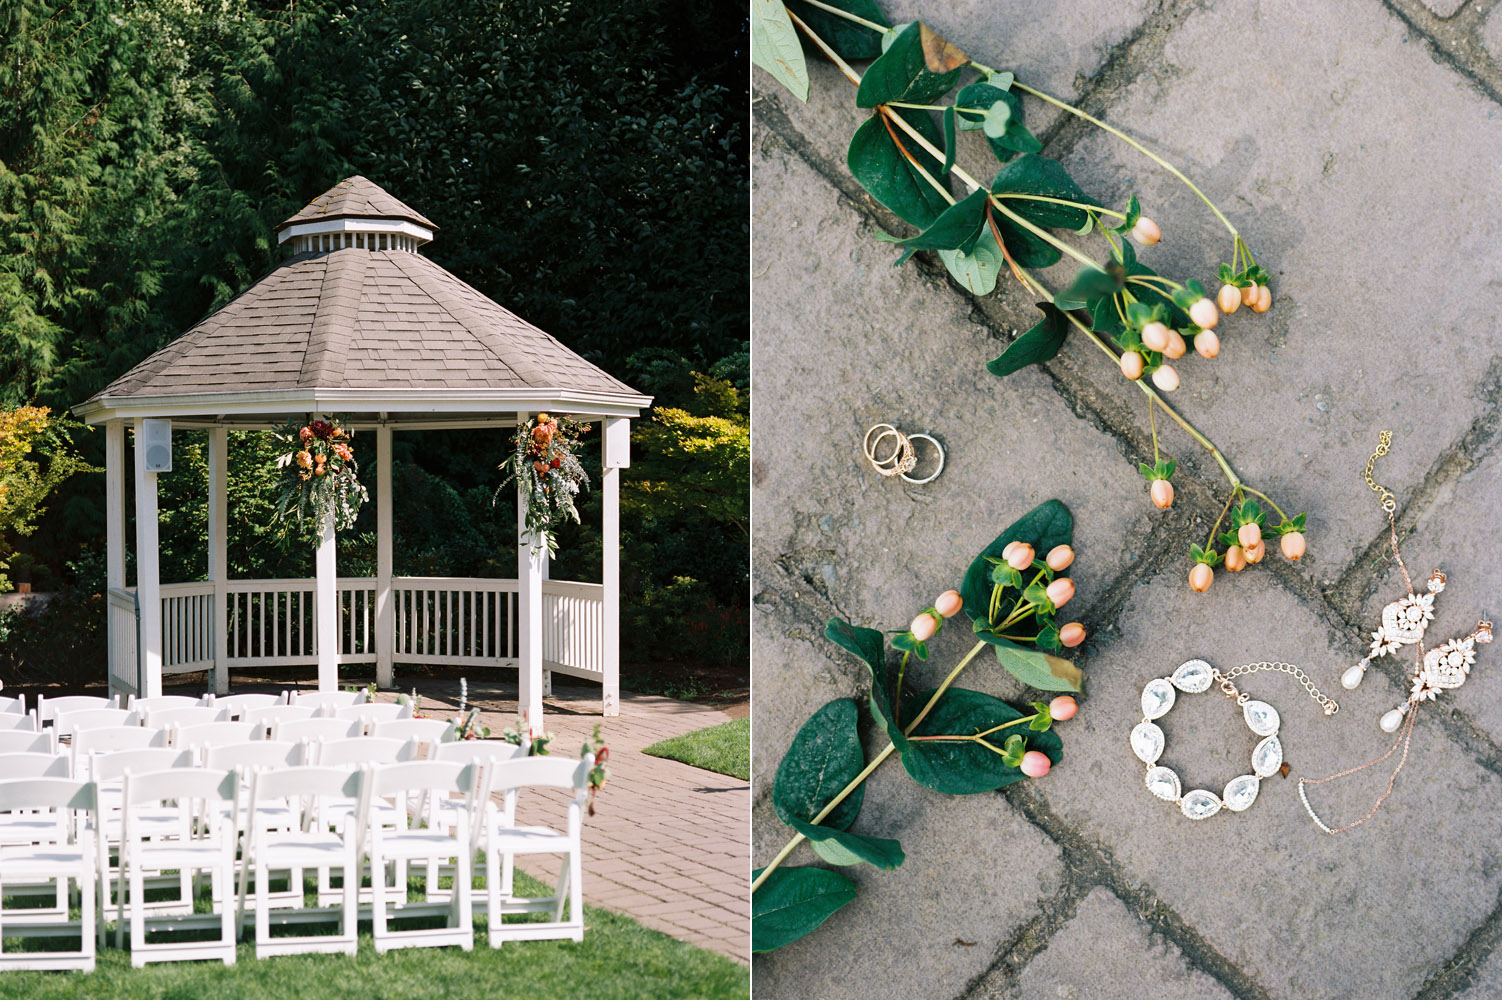 Seattle Issaquah Outdoor Wedding Venue Pickering Barn Details.jpg